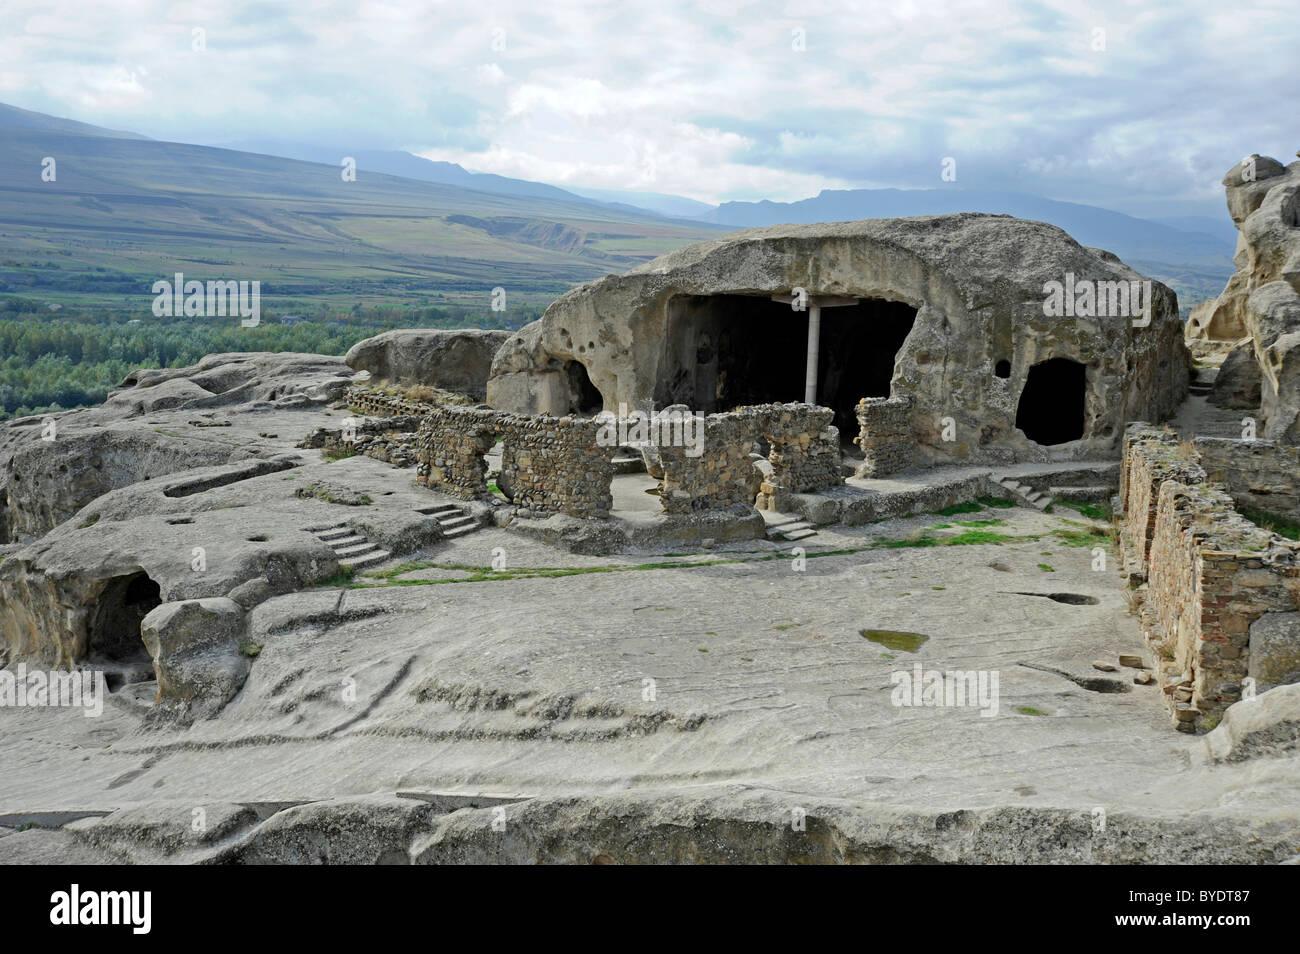 Cave complex town of Uplistsikhe, since 10th Century BC, Georgia, Eurasia - Stock Image